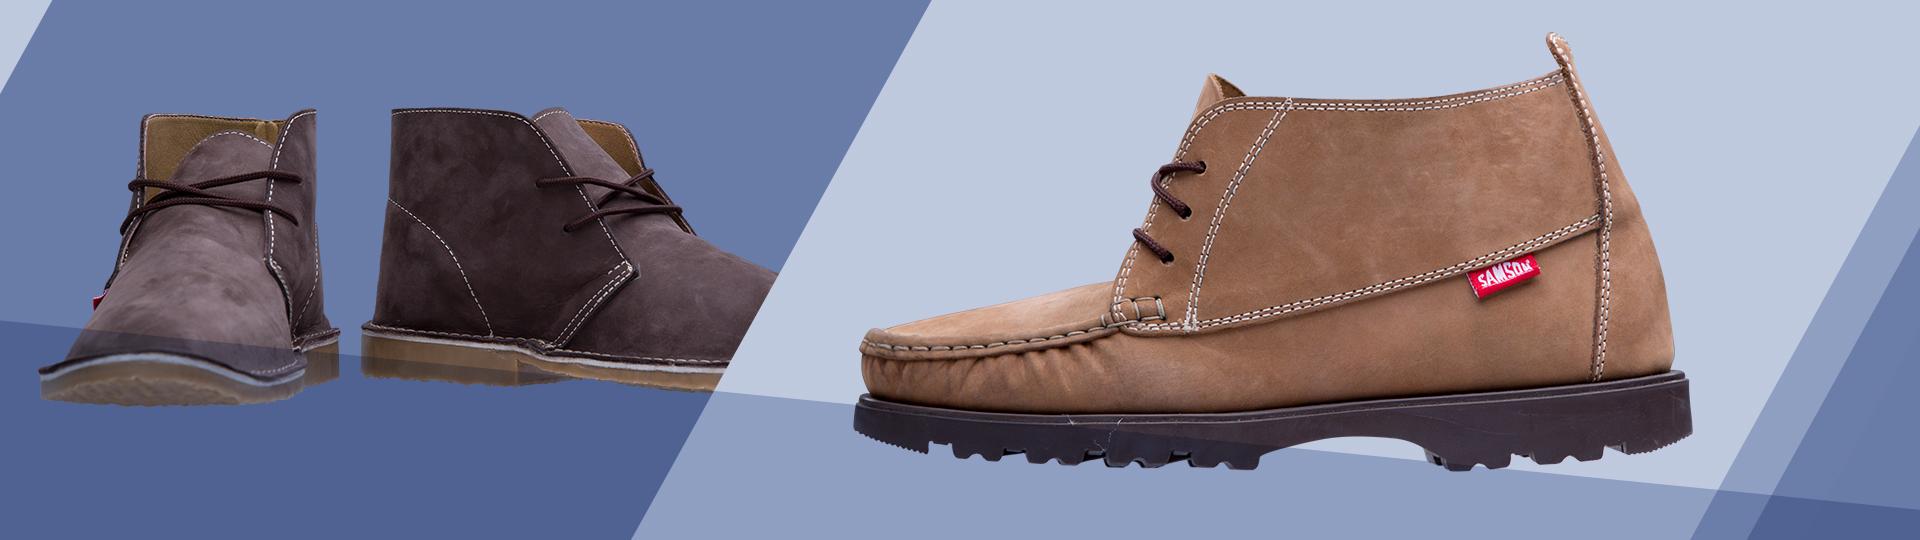 Samson - Shoes